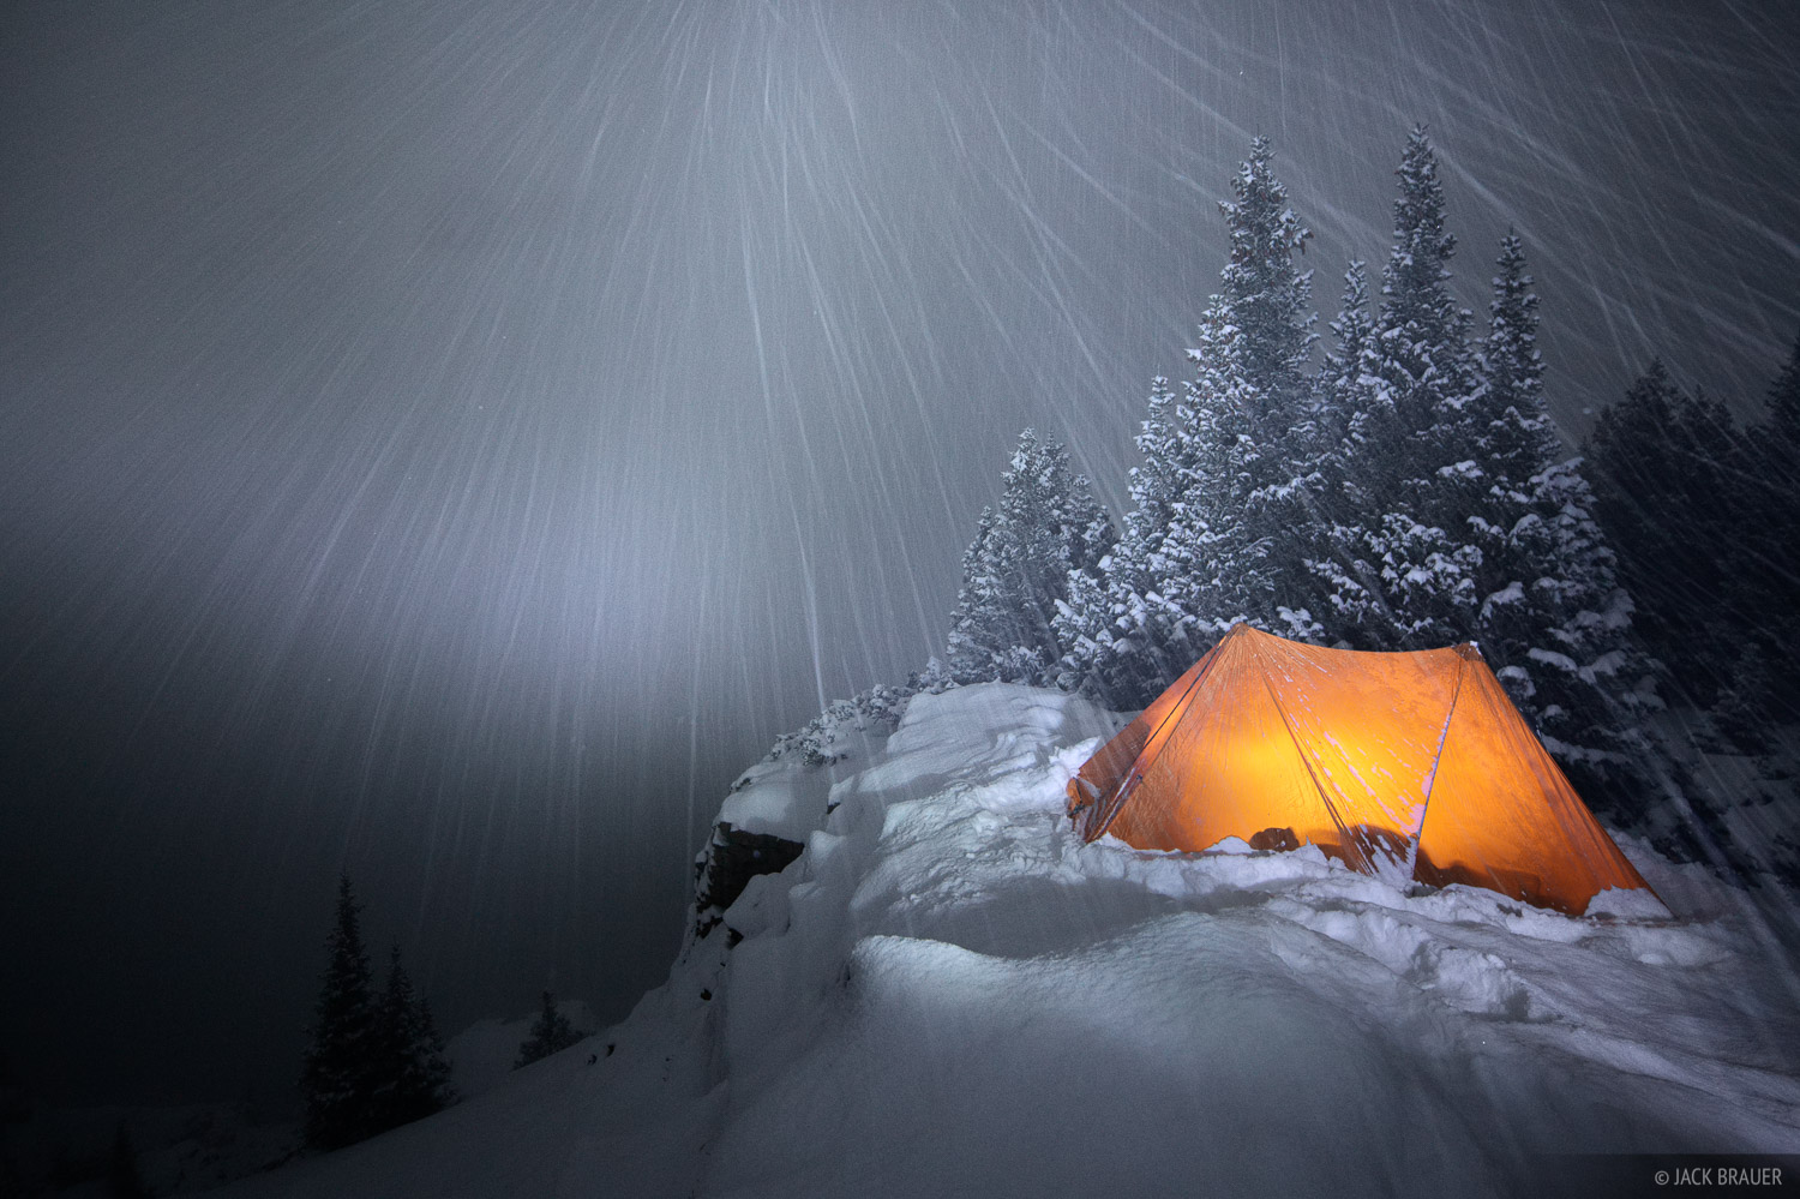 Sneffels, San Juan Mountains, Colorado, winter, camp, tent, snowy, photo